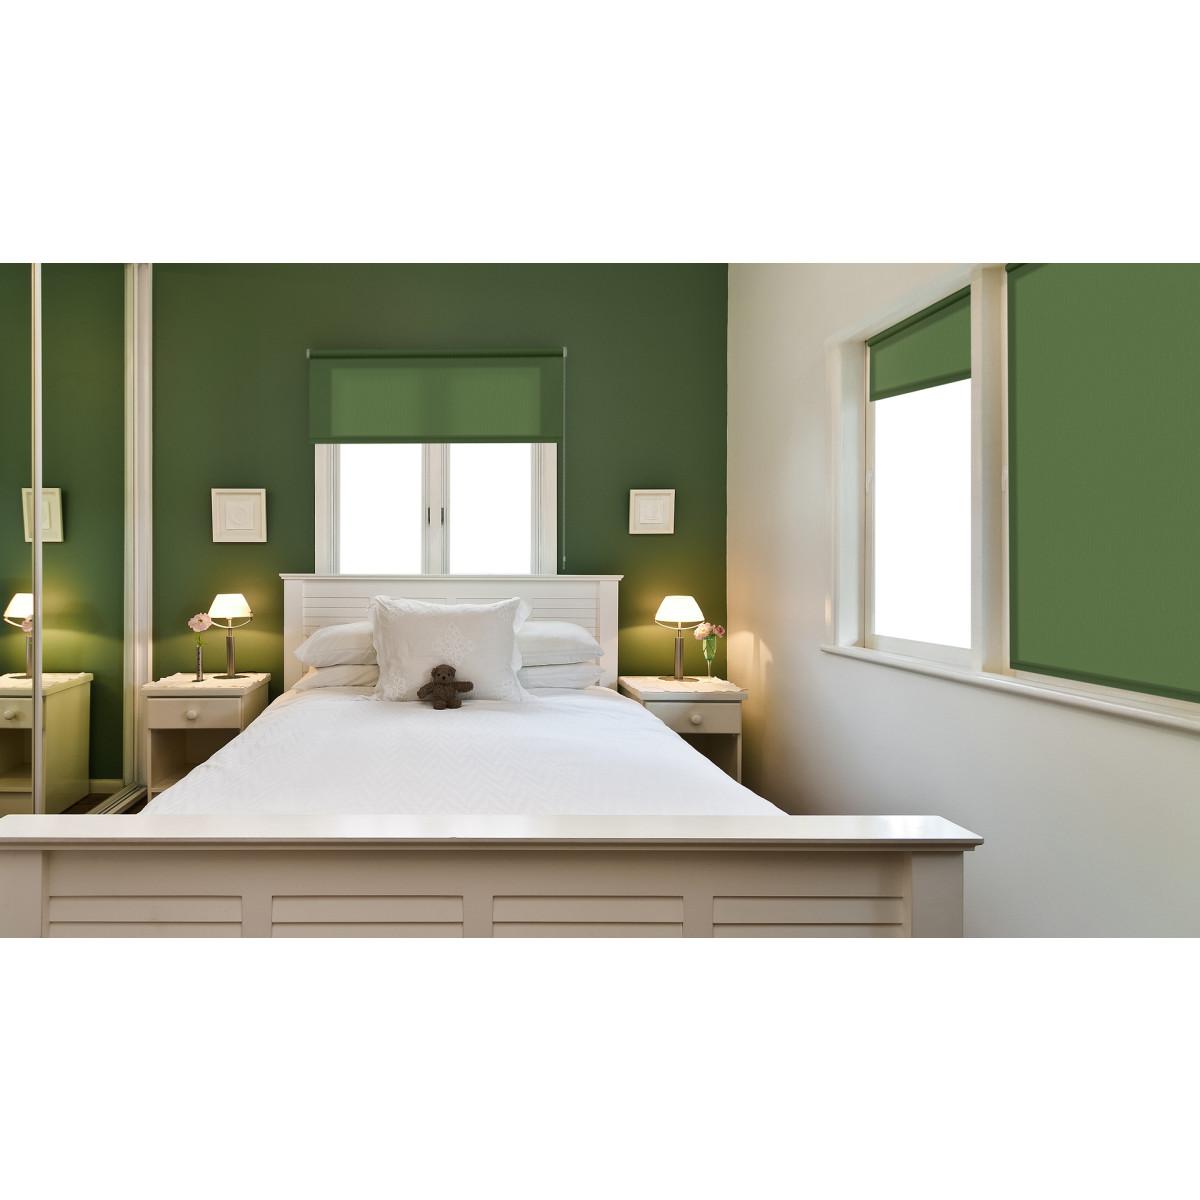 Рулонная Ора Decofest Апилера 90Х160 Цвет Зеленый